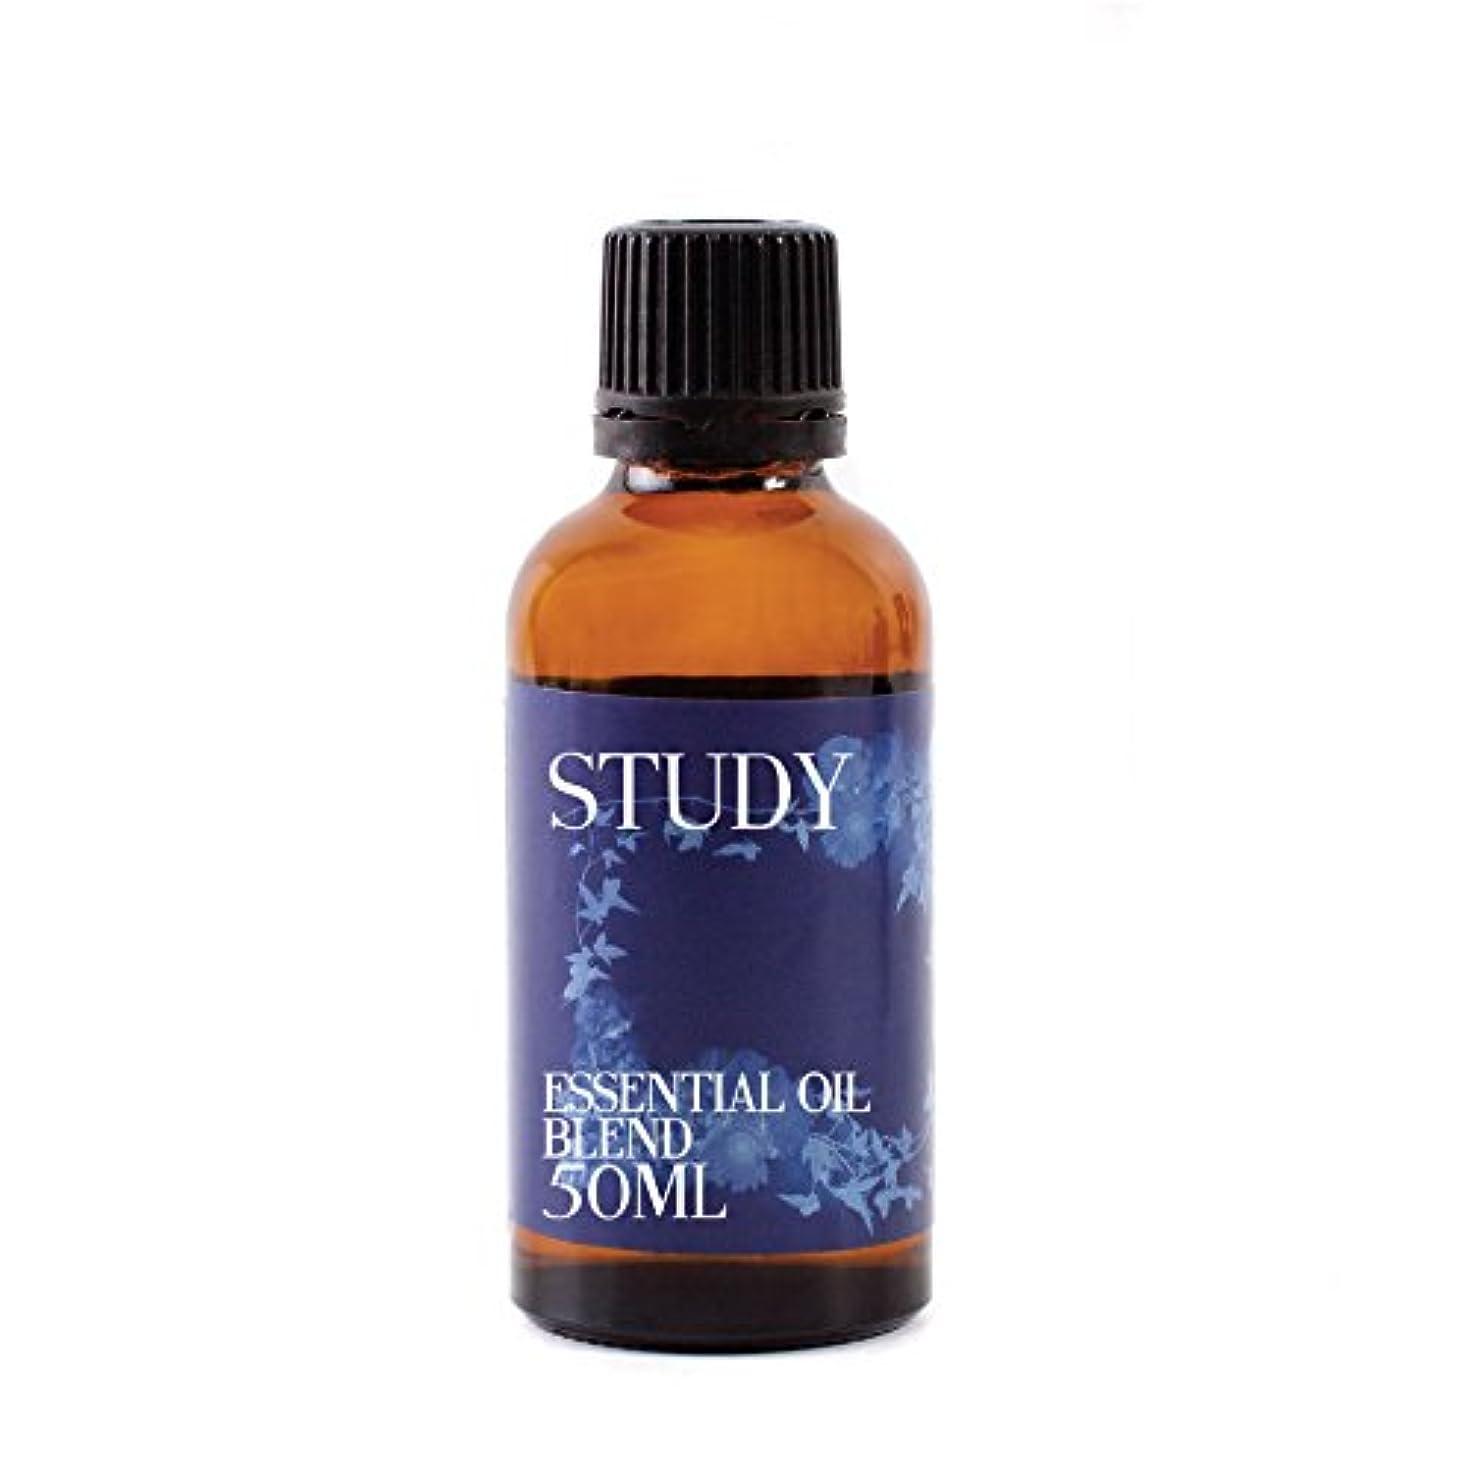 Mystic Moments | Study Essential Oil Blend - 50ml - 100% Pure